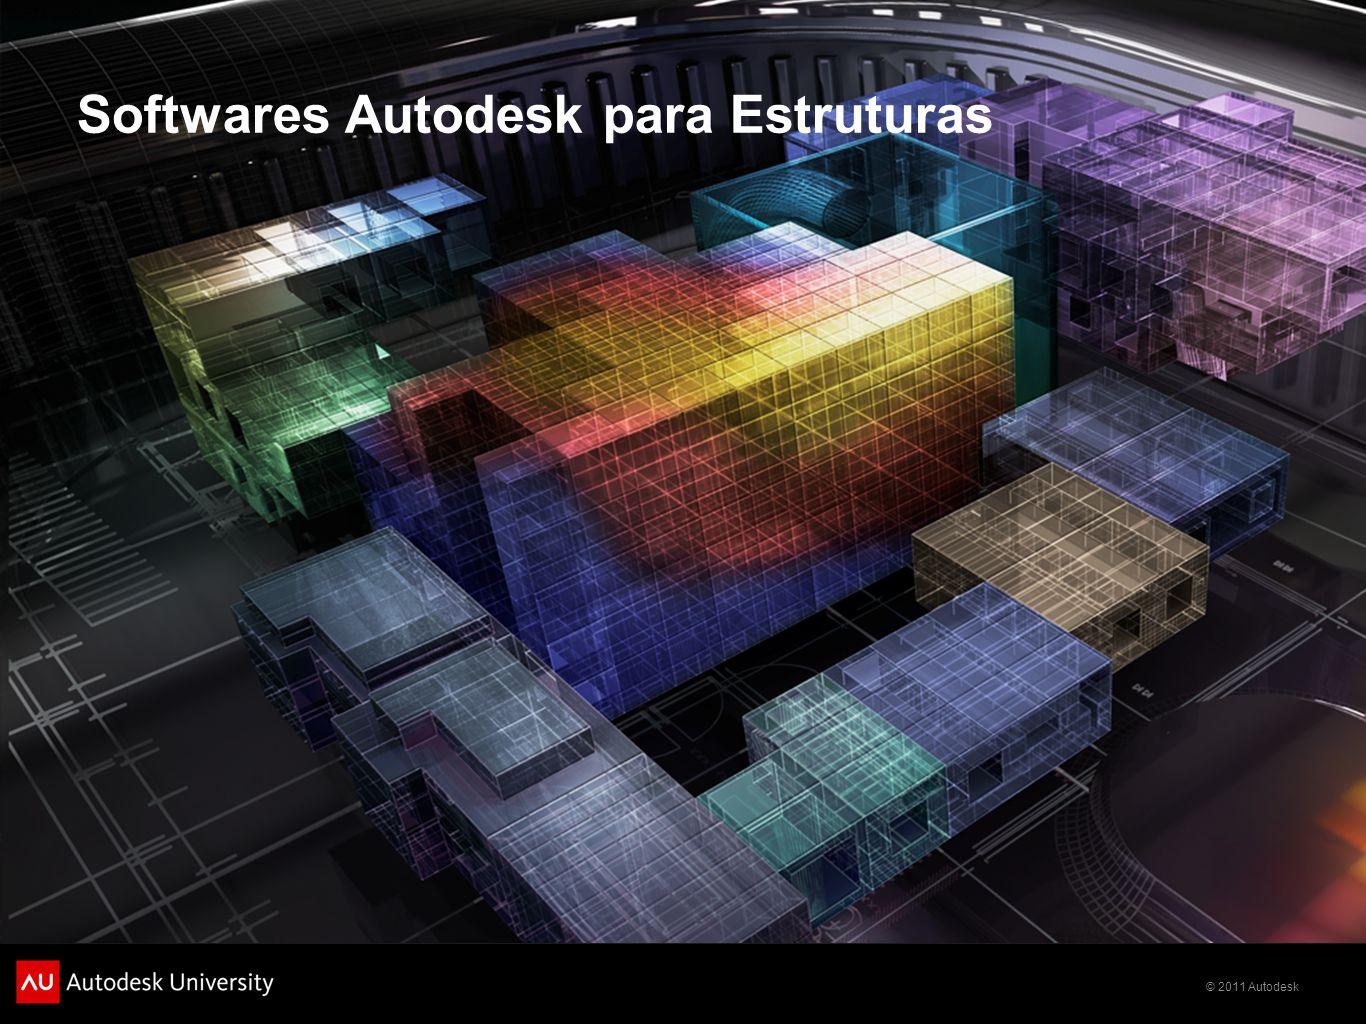 Softwares Autodesk para Estruturas